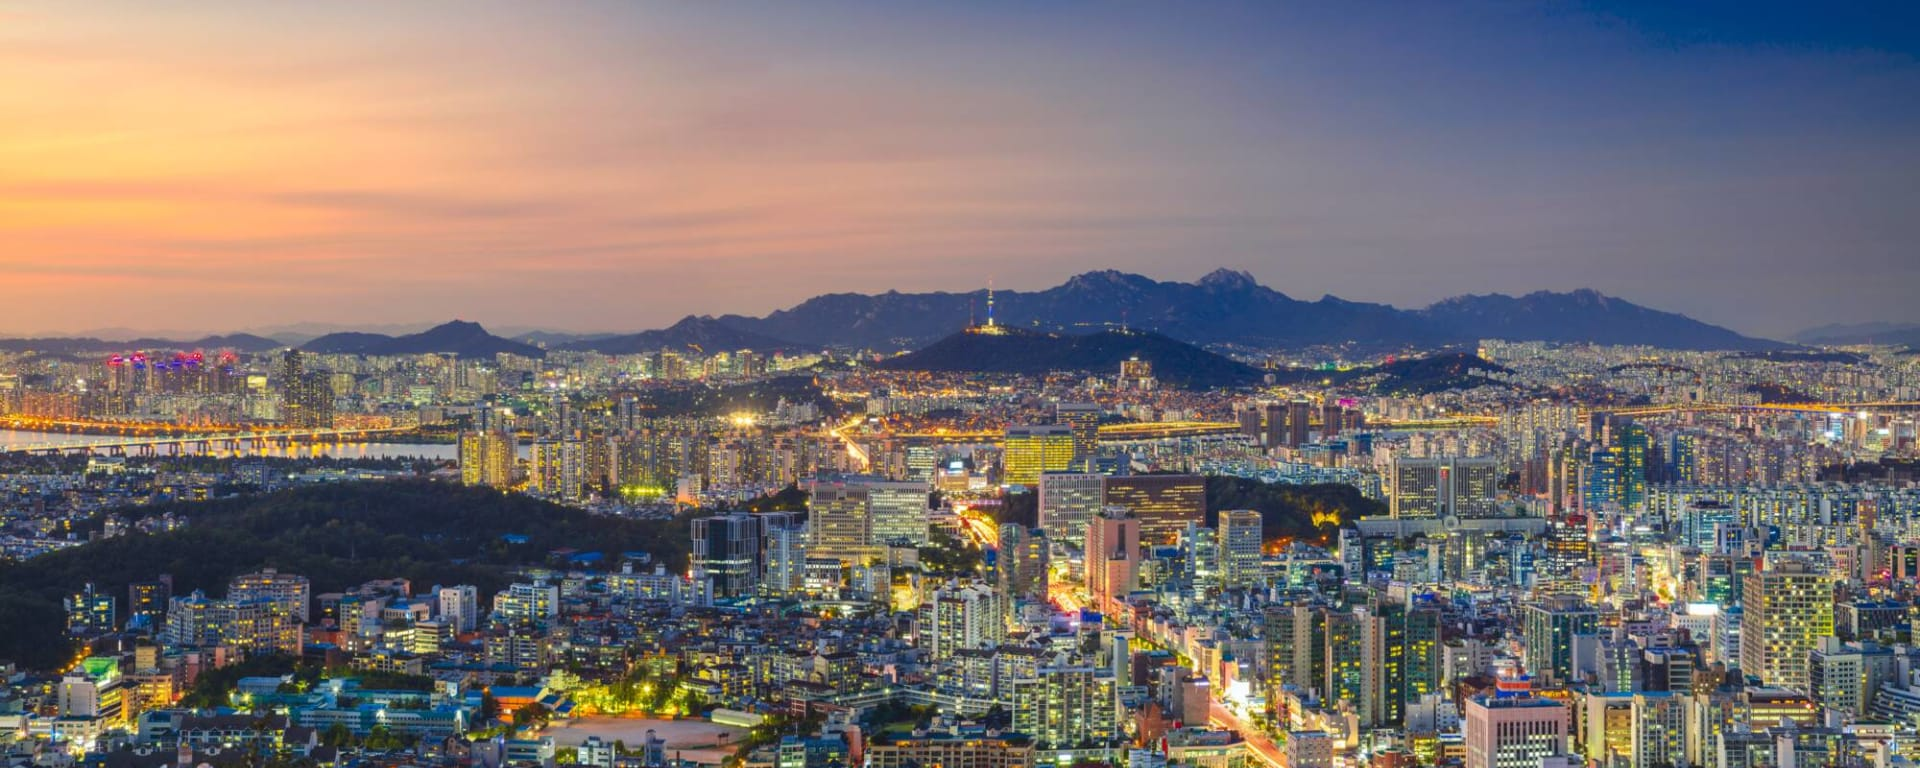 Südkorea entdecken mit Tischler Reisen: Südkorea Seoul Panorama